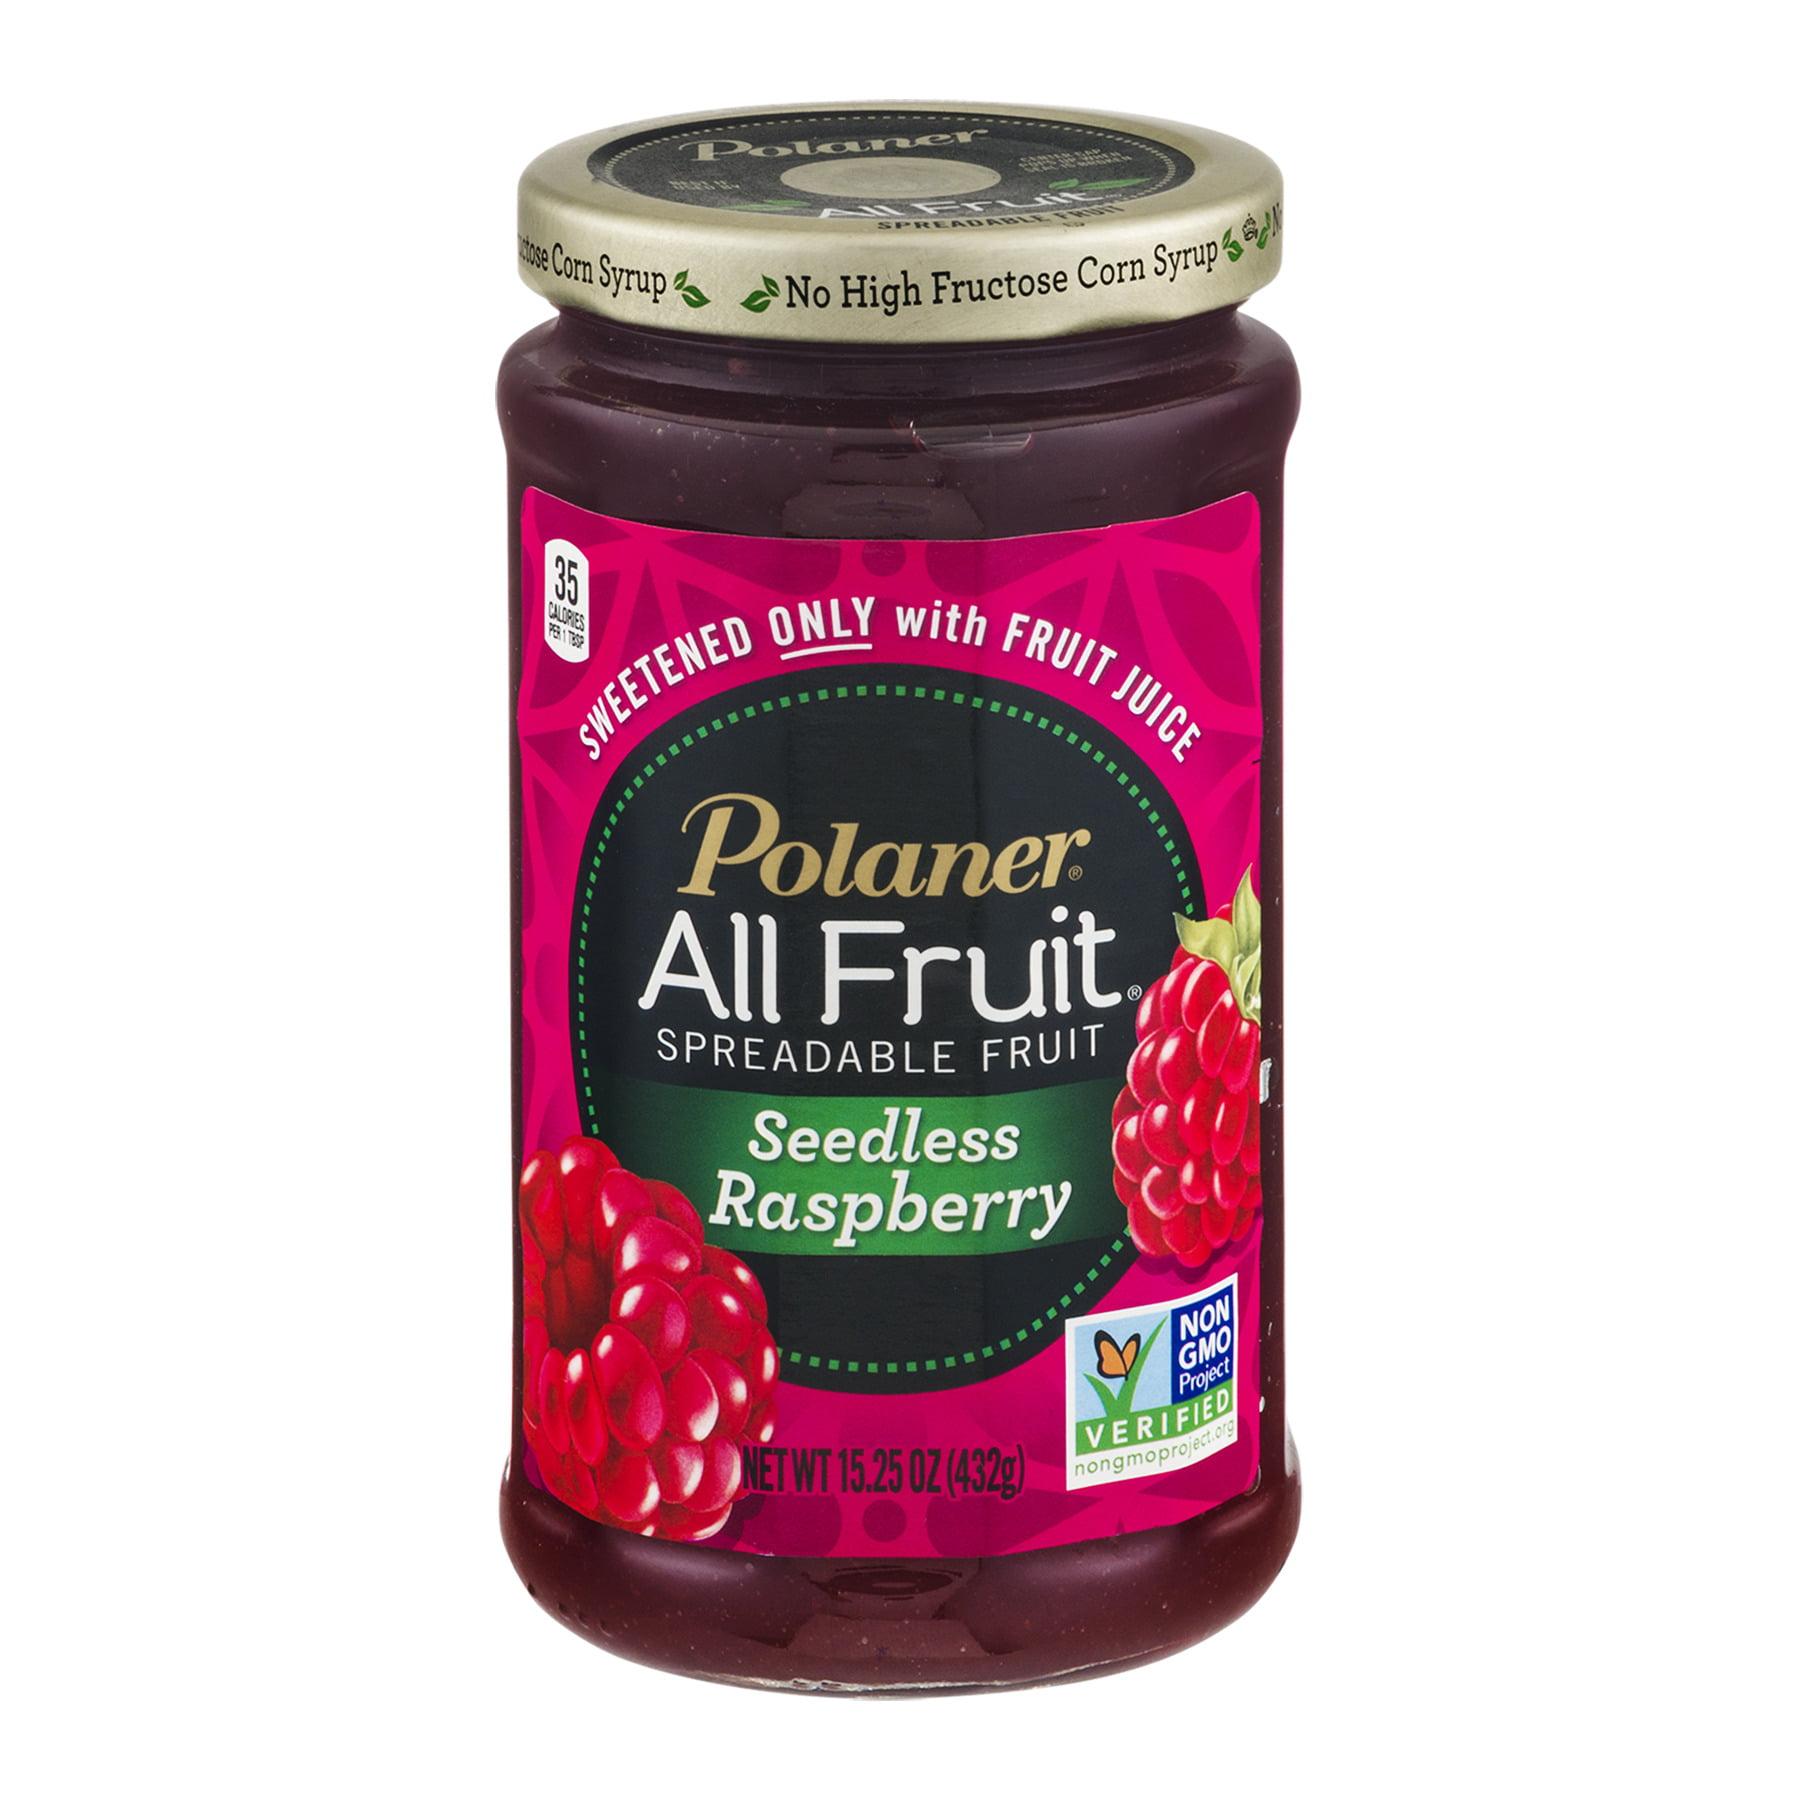 Polaner® All Fruit® Seedless Raspberry Spreadable Fruit 15.25 oz. Jar